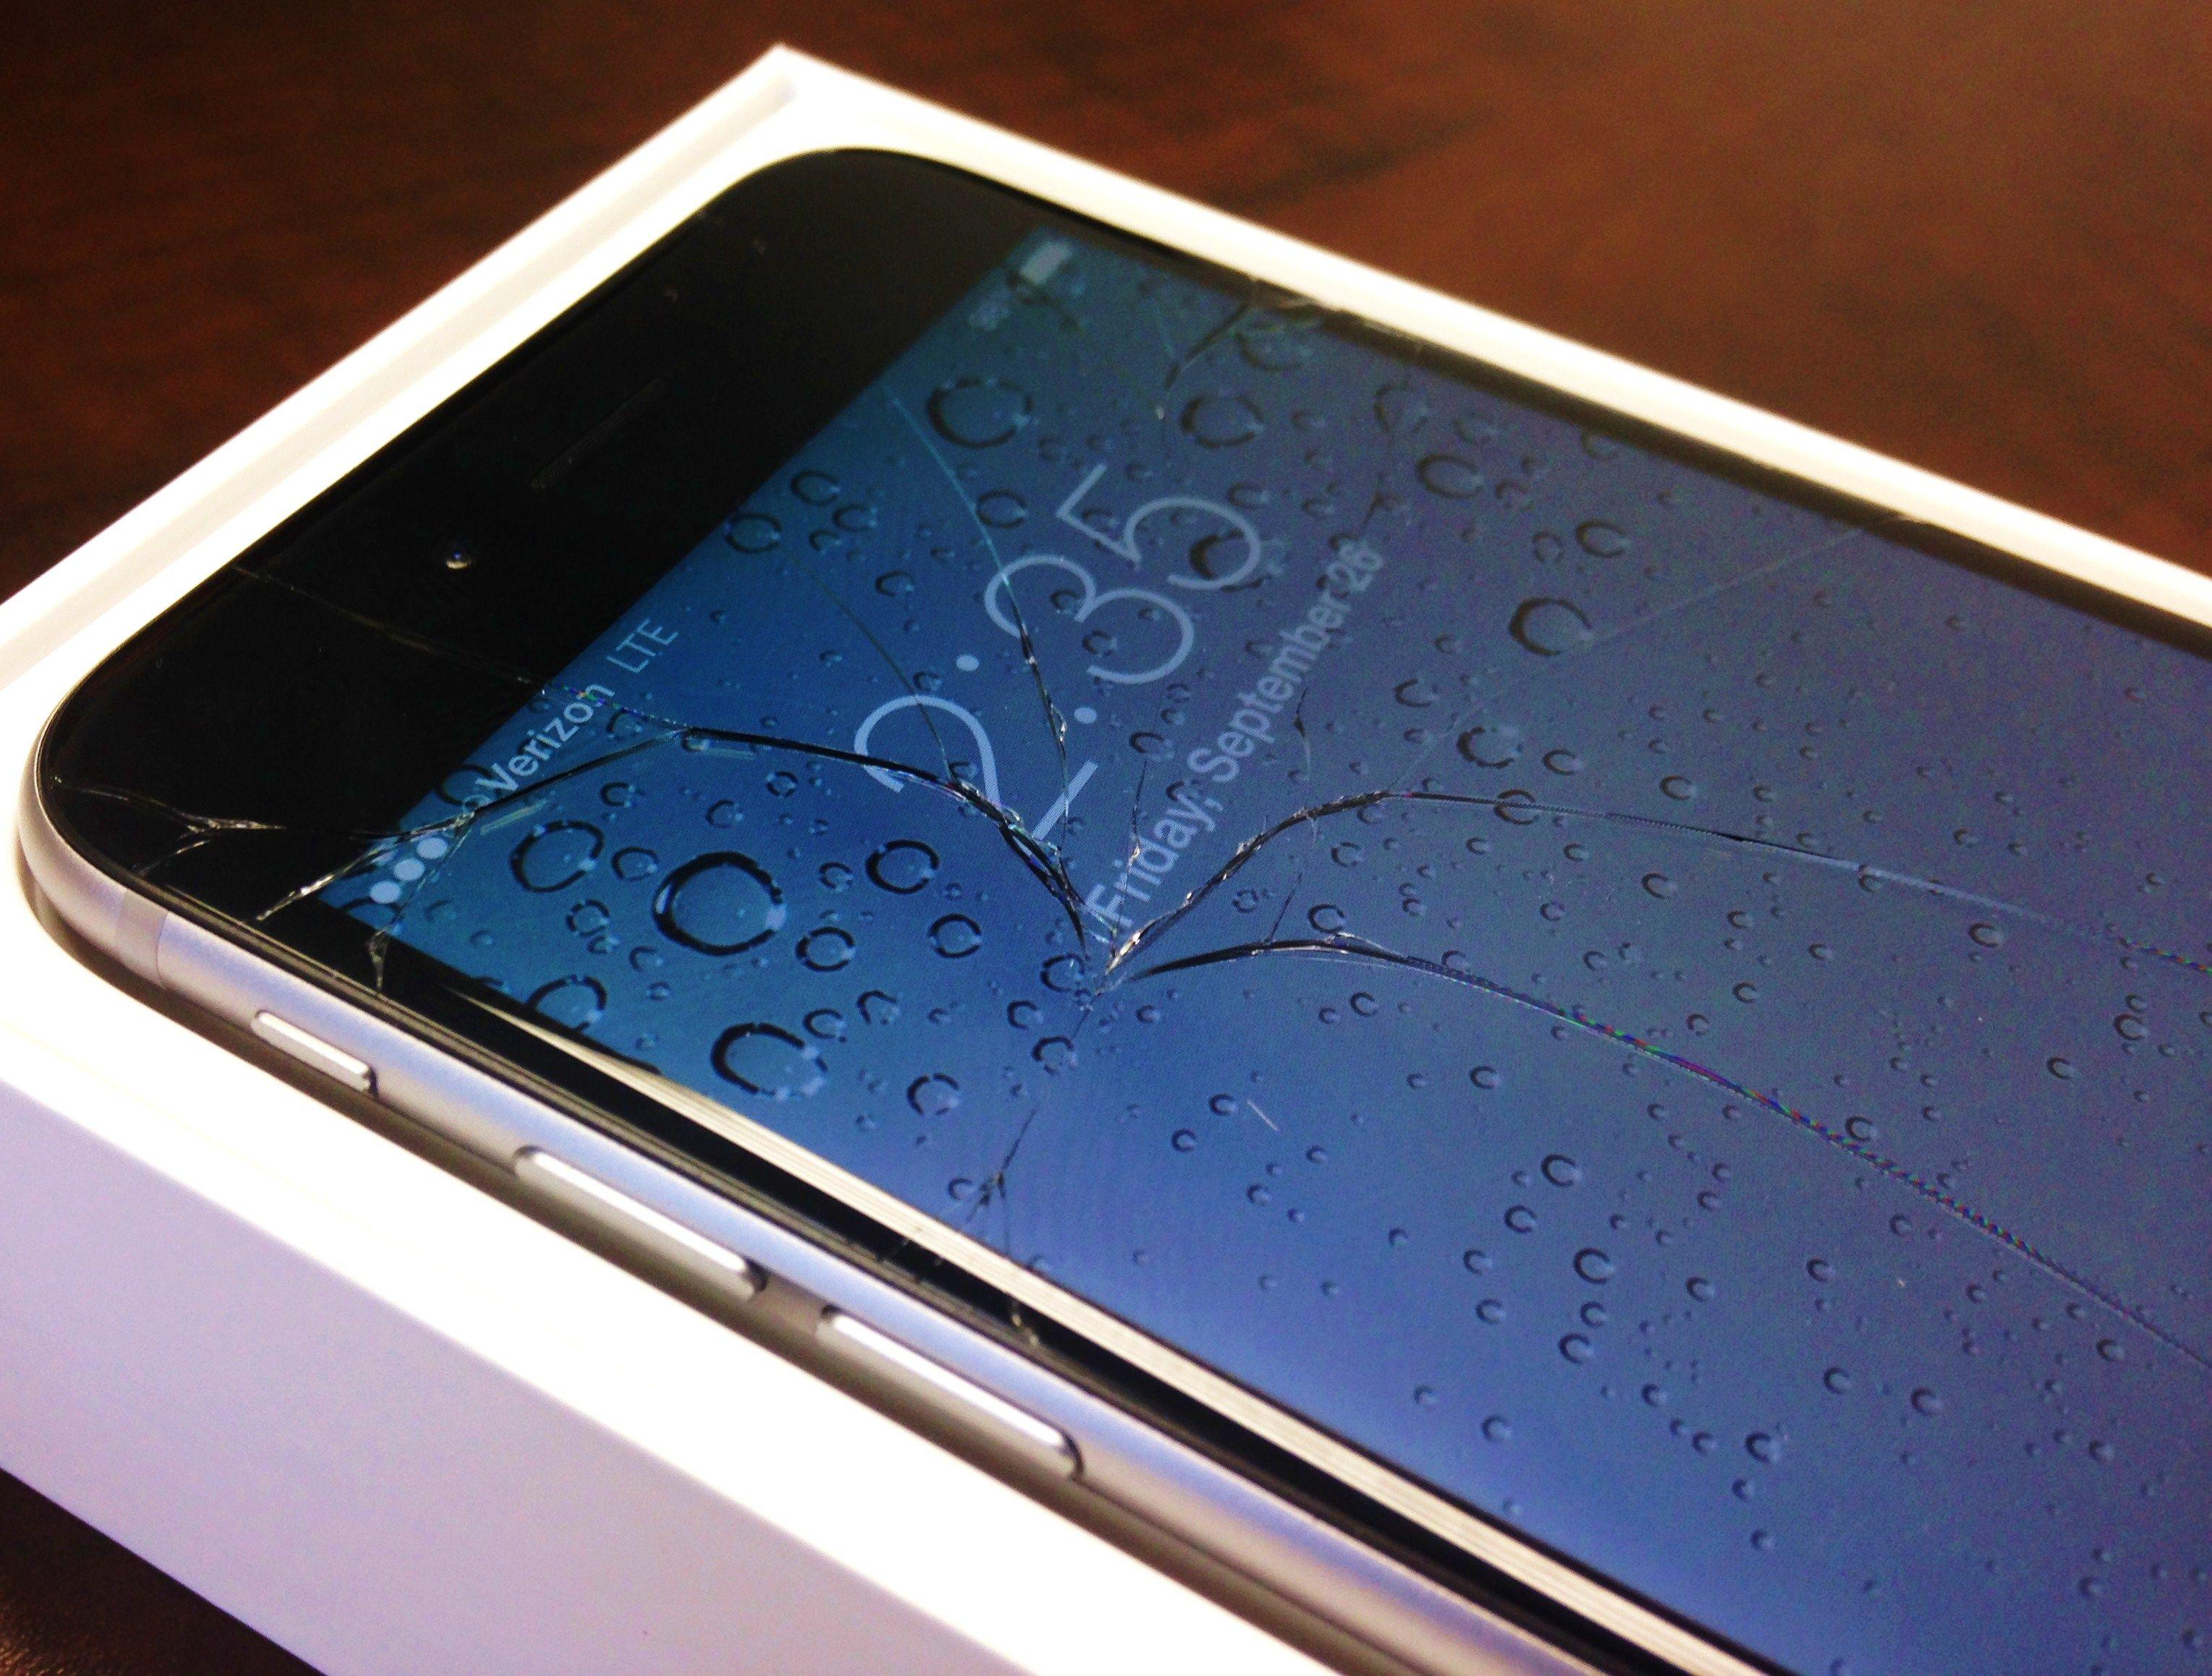 треснуло стекло на iphone 6